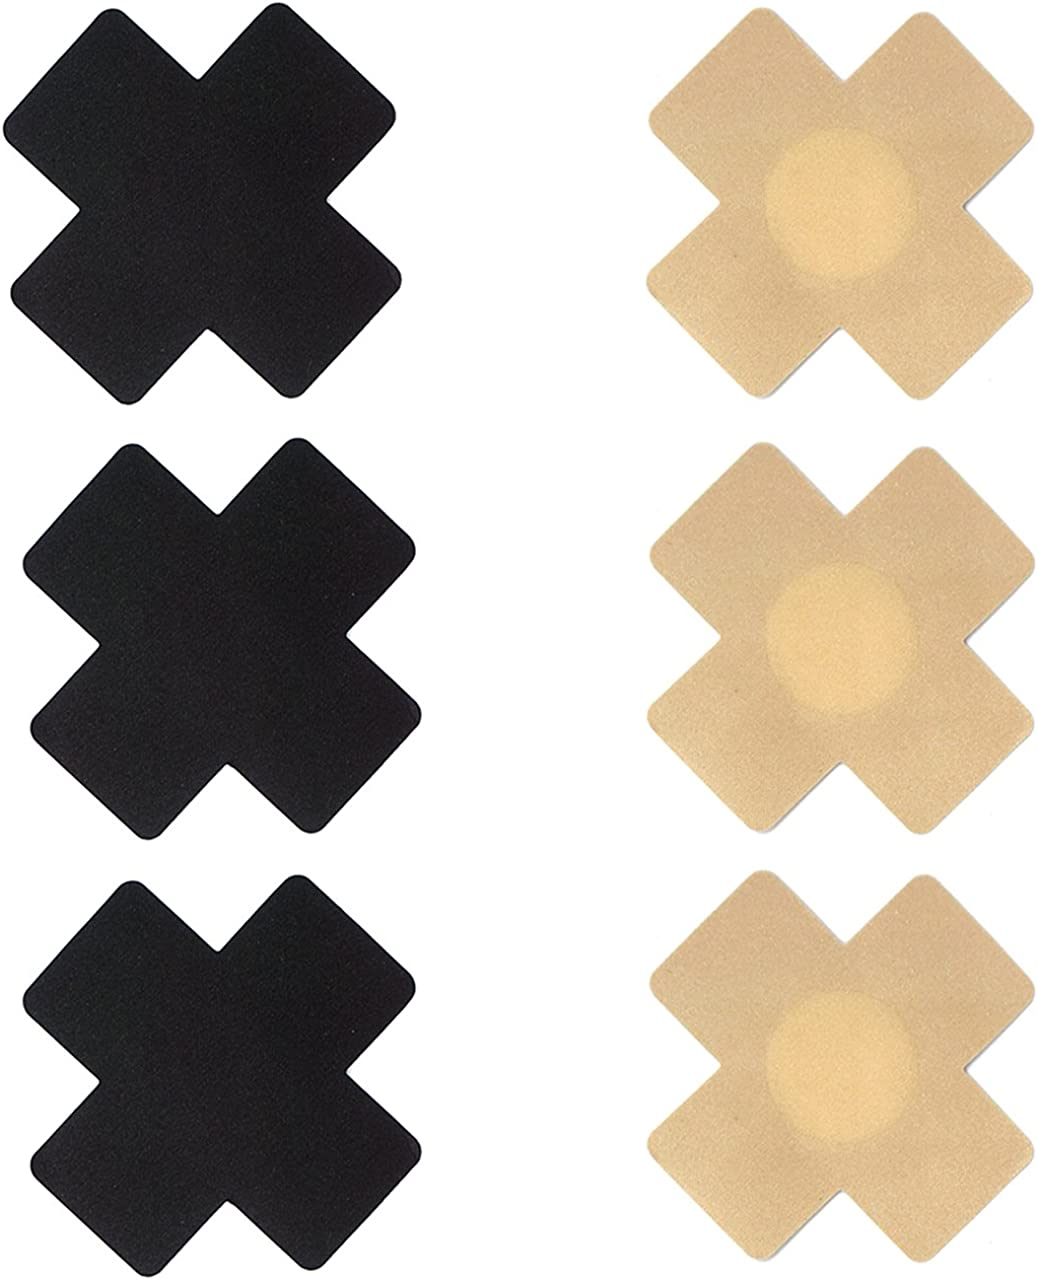 Post Malone Custom Graphics Pasties Boobie Stickers and Nipple Covers